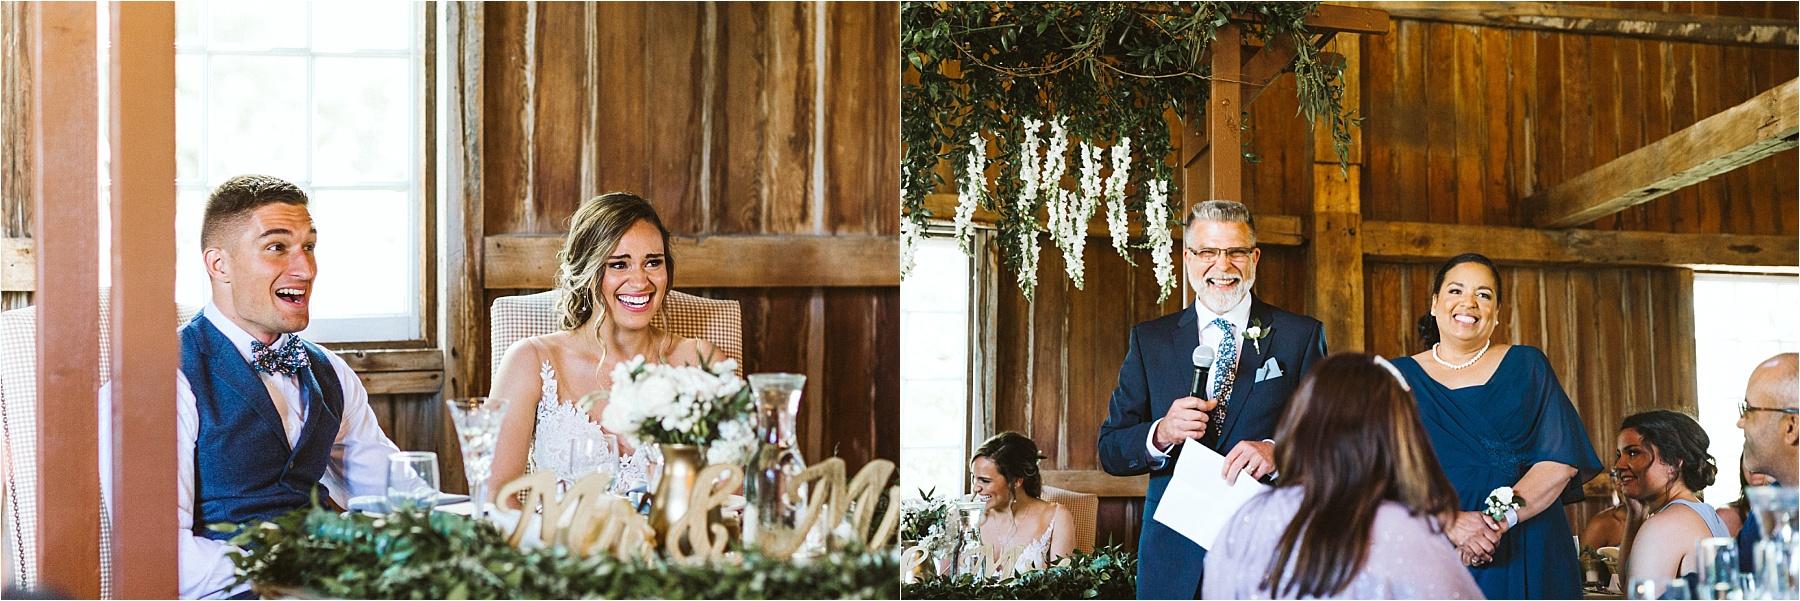 Hidden Vineyard Wedding_0099.jpg